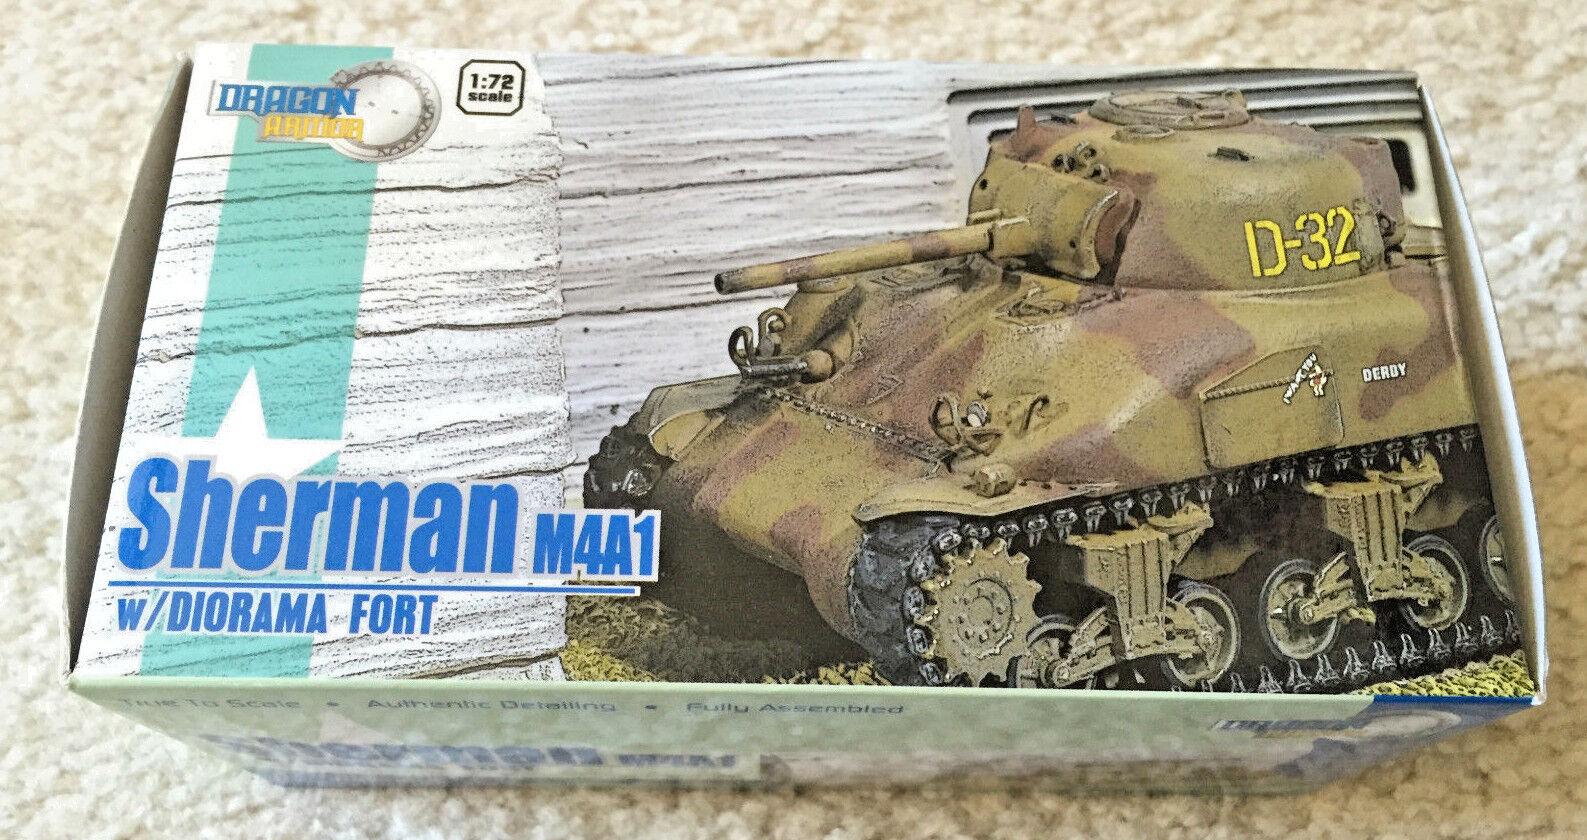 drake Armor 6037 M4A1 Sherman _D32, Normandie, Frankrike, 1944 w  Fort Diorama